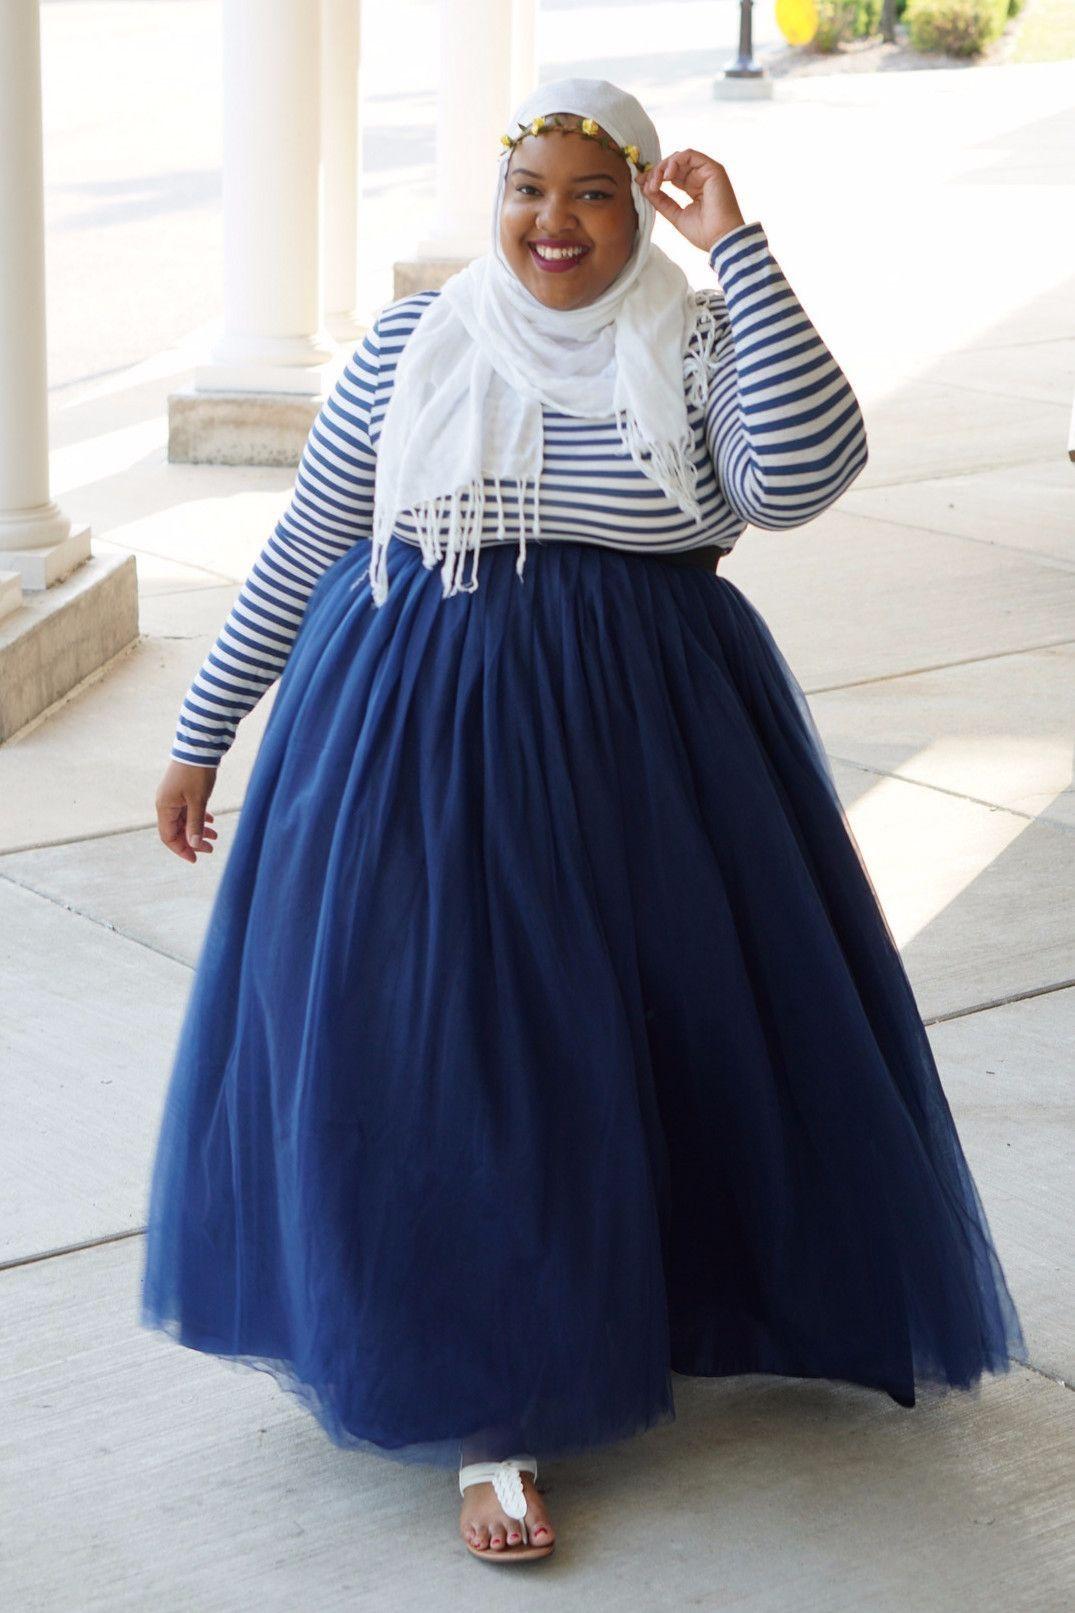 c32ff112fa Plus Size Long Tutu - Navy (Sizes 1X - 6X) - Society Plus - Plus Size  Fashion for Women